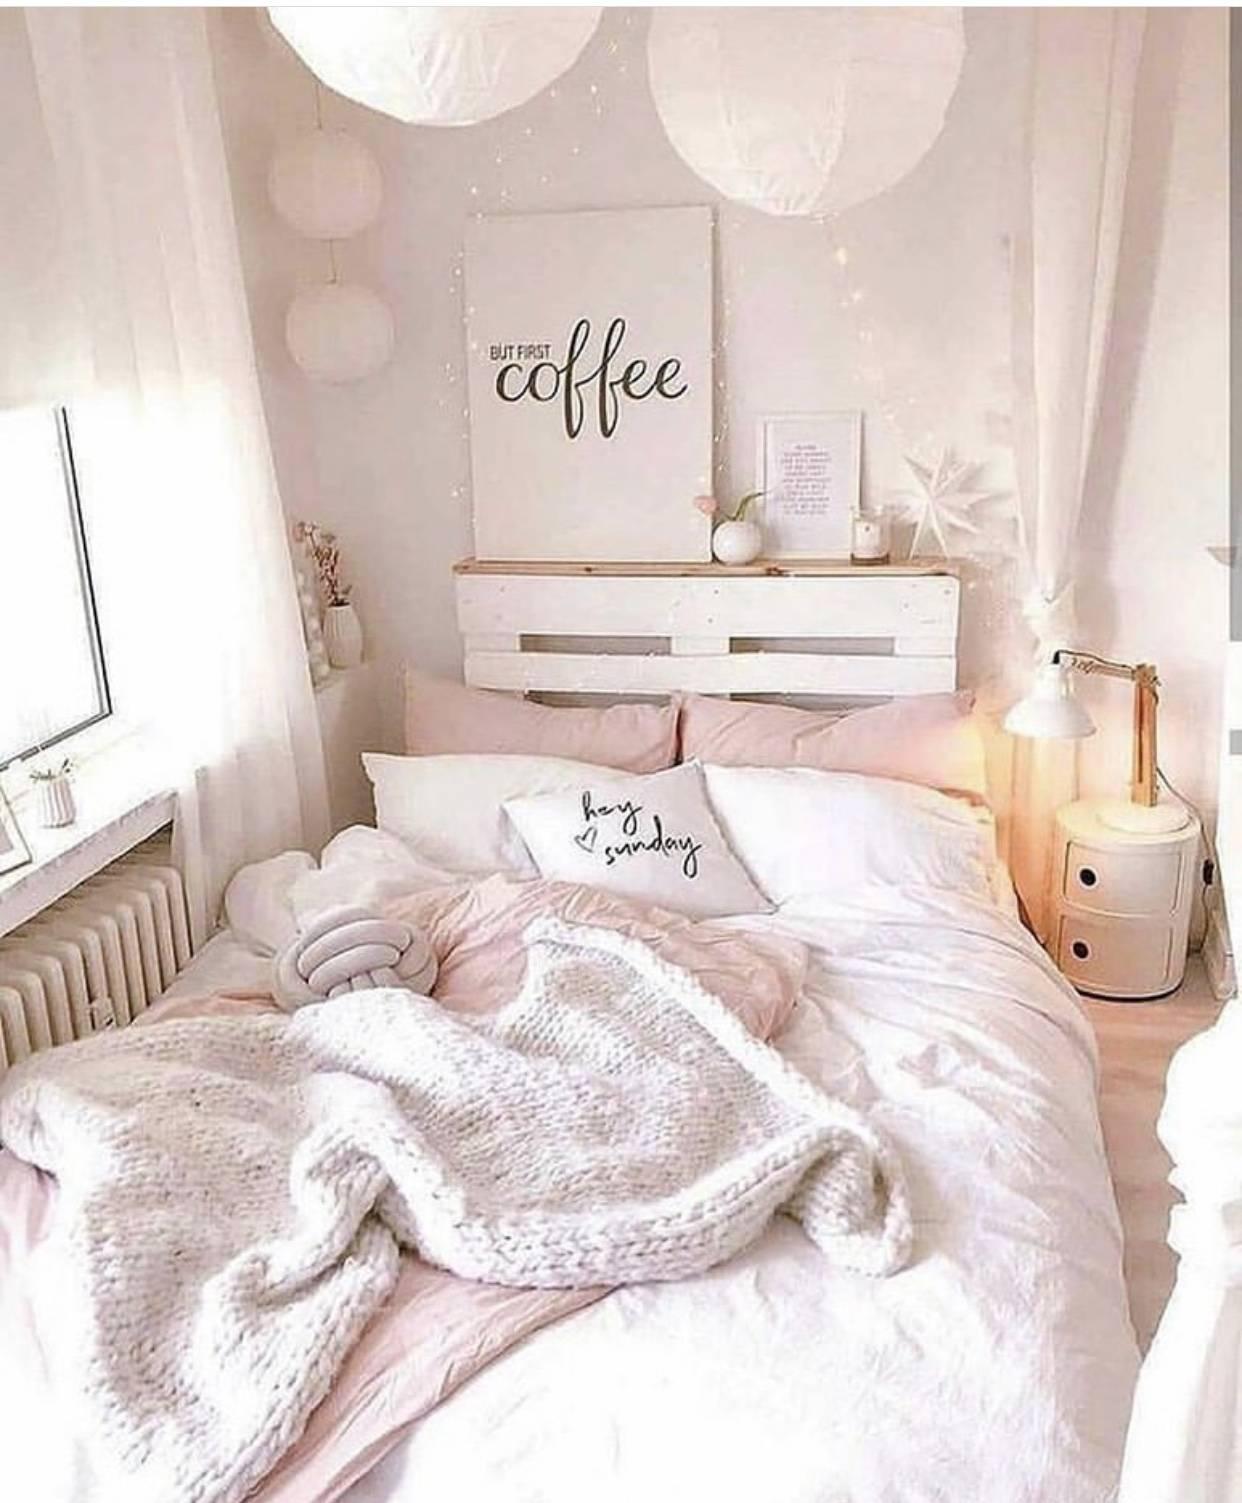 Vsco Decor Ideas - Must Have Decor for a Vsco Room - The